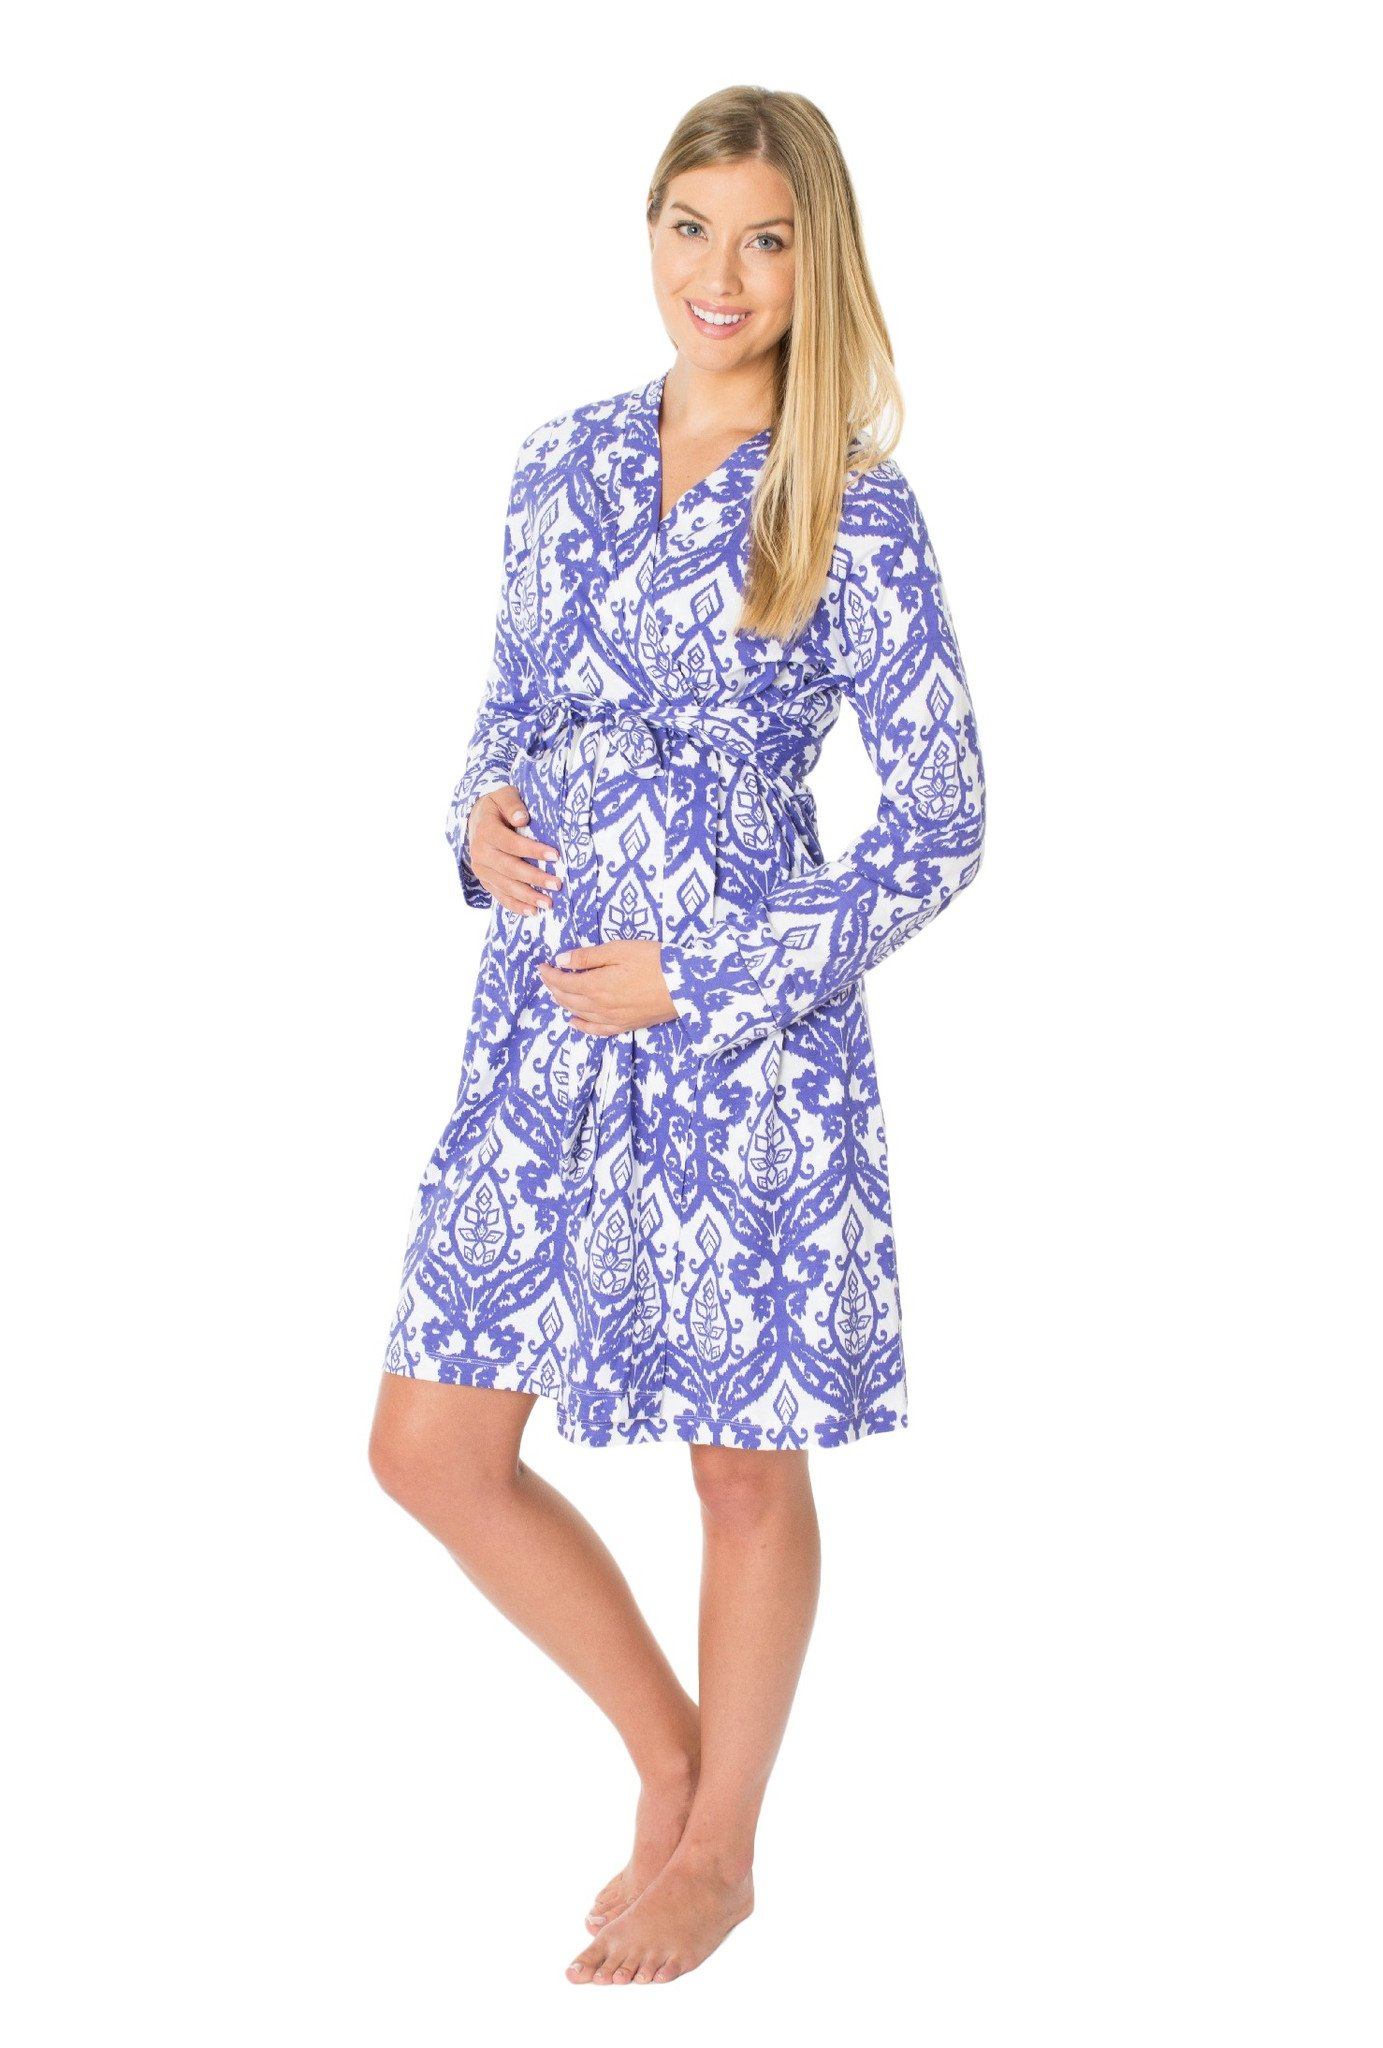 Cheap Nursing Robe, find Nursing Robe deals on line at Alibaba.com